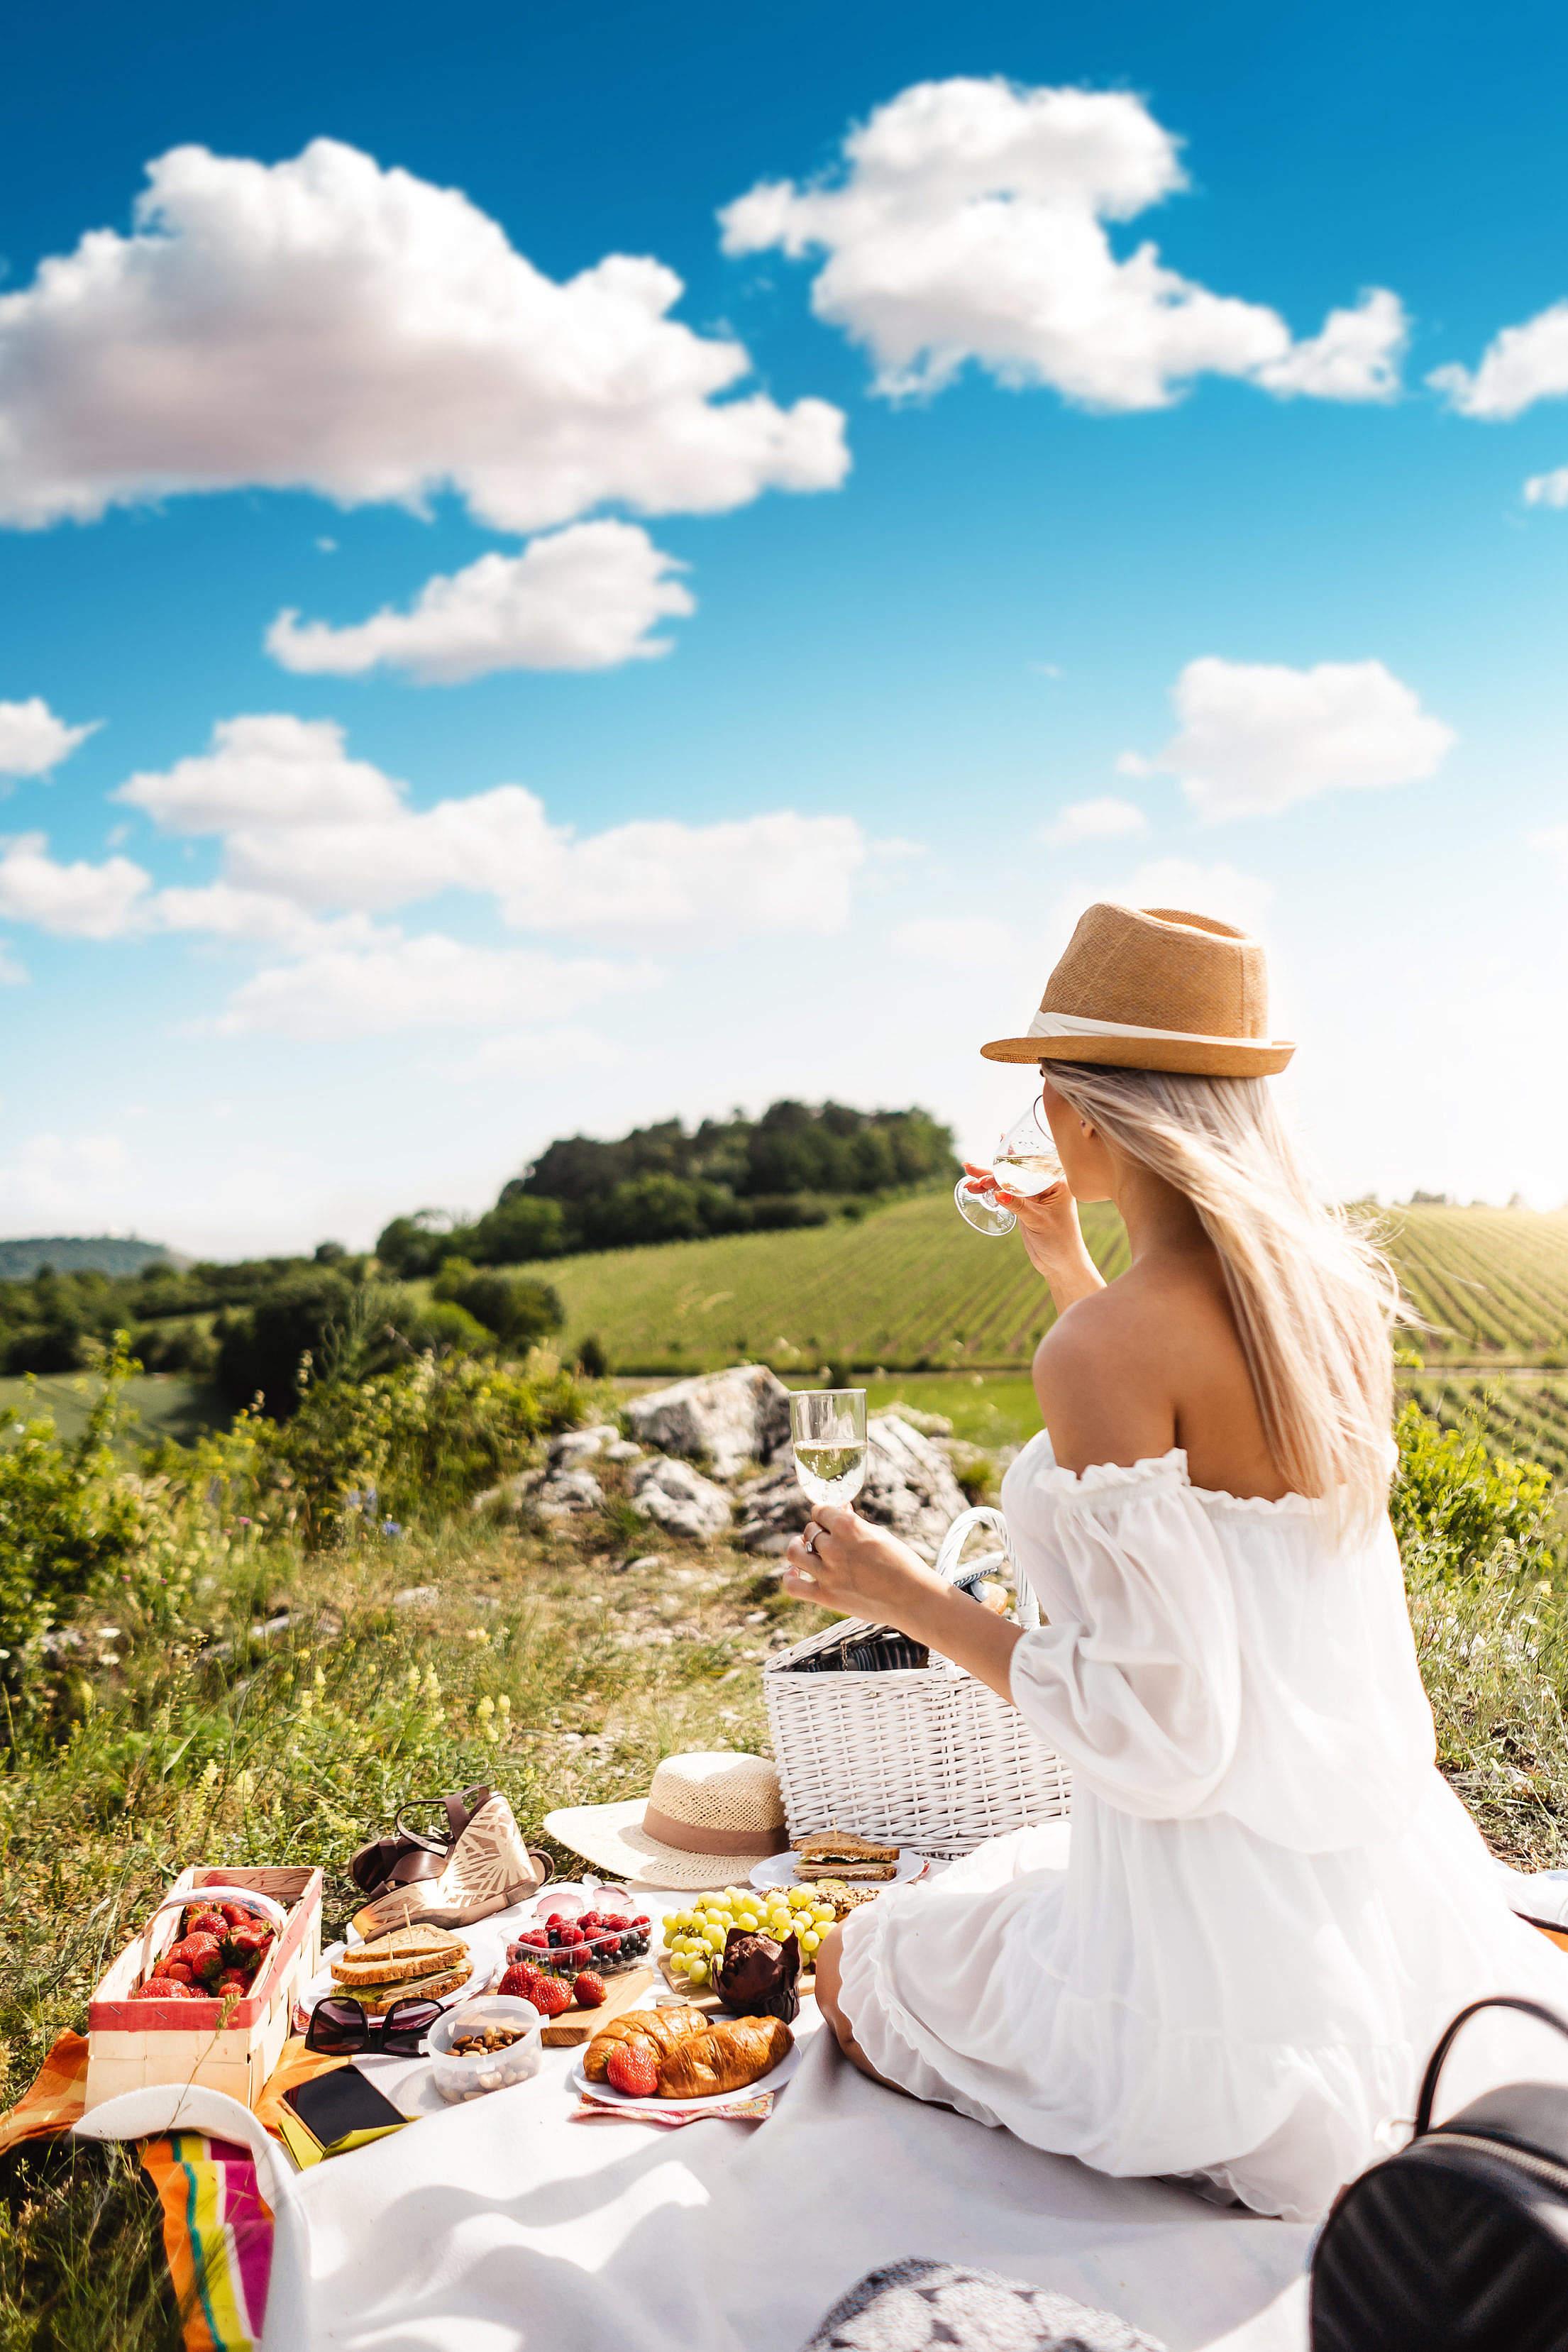 Young Woman Enjoying a Picnic Free Stock Photo